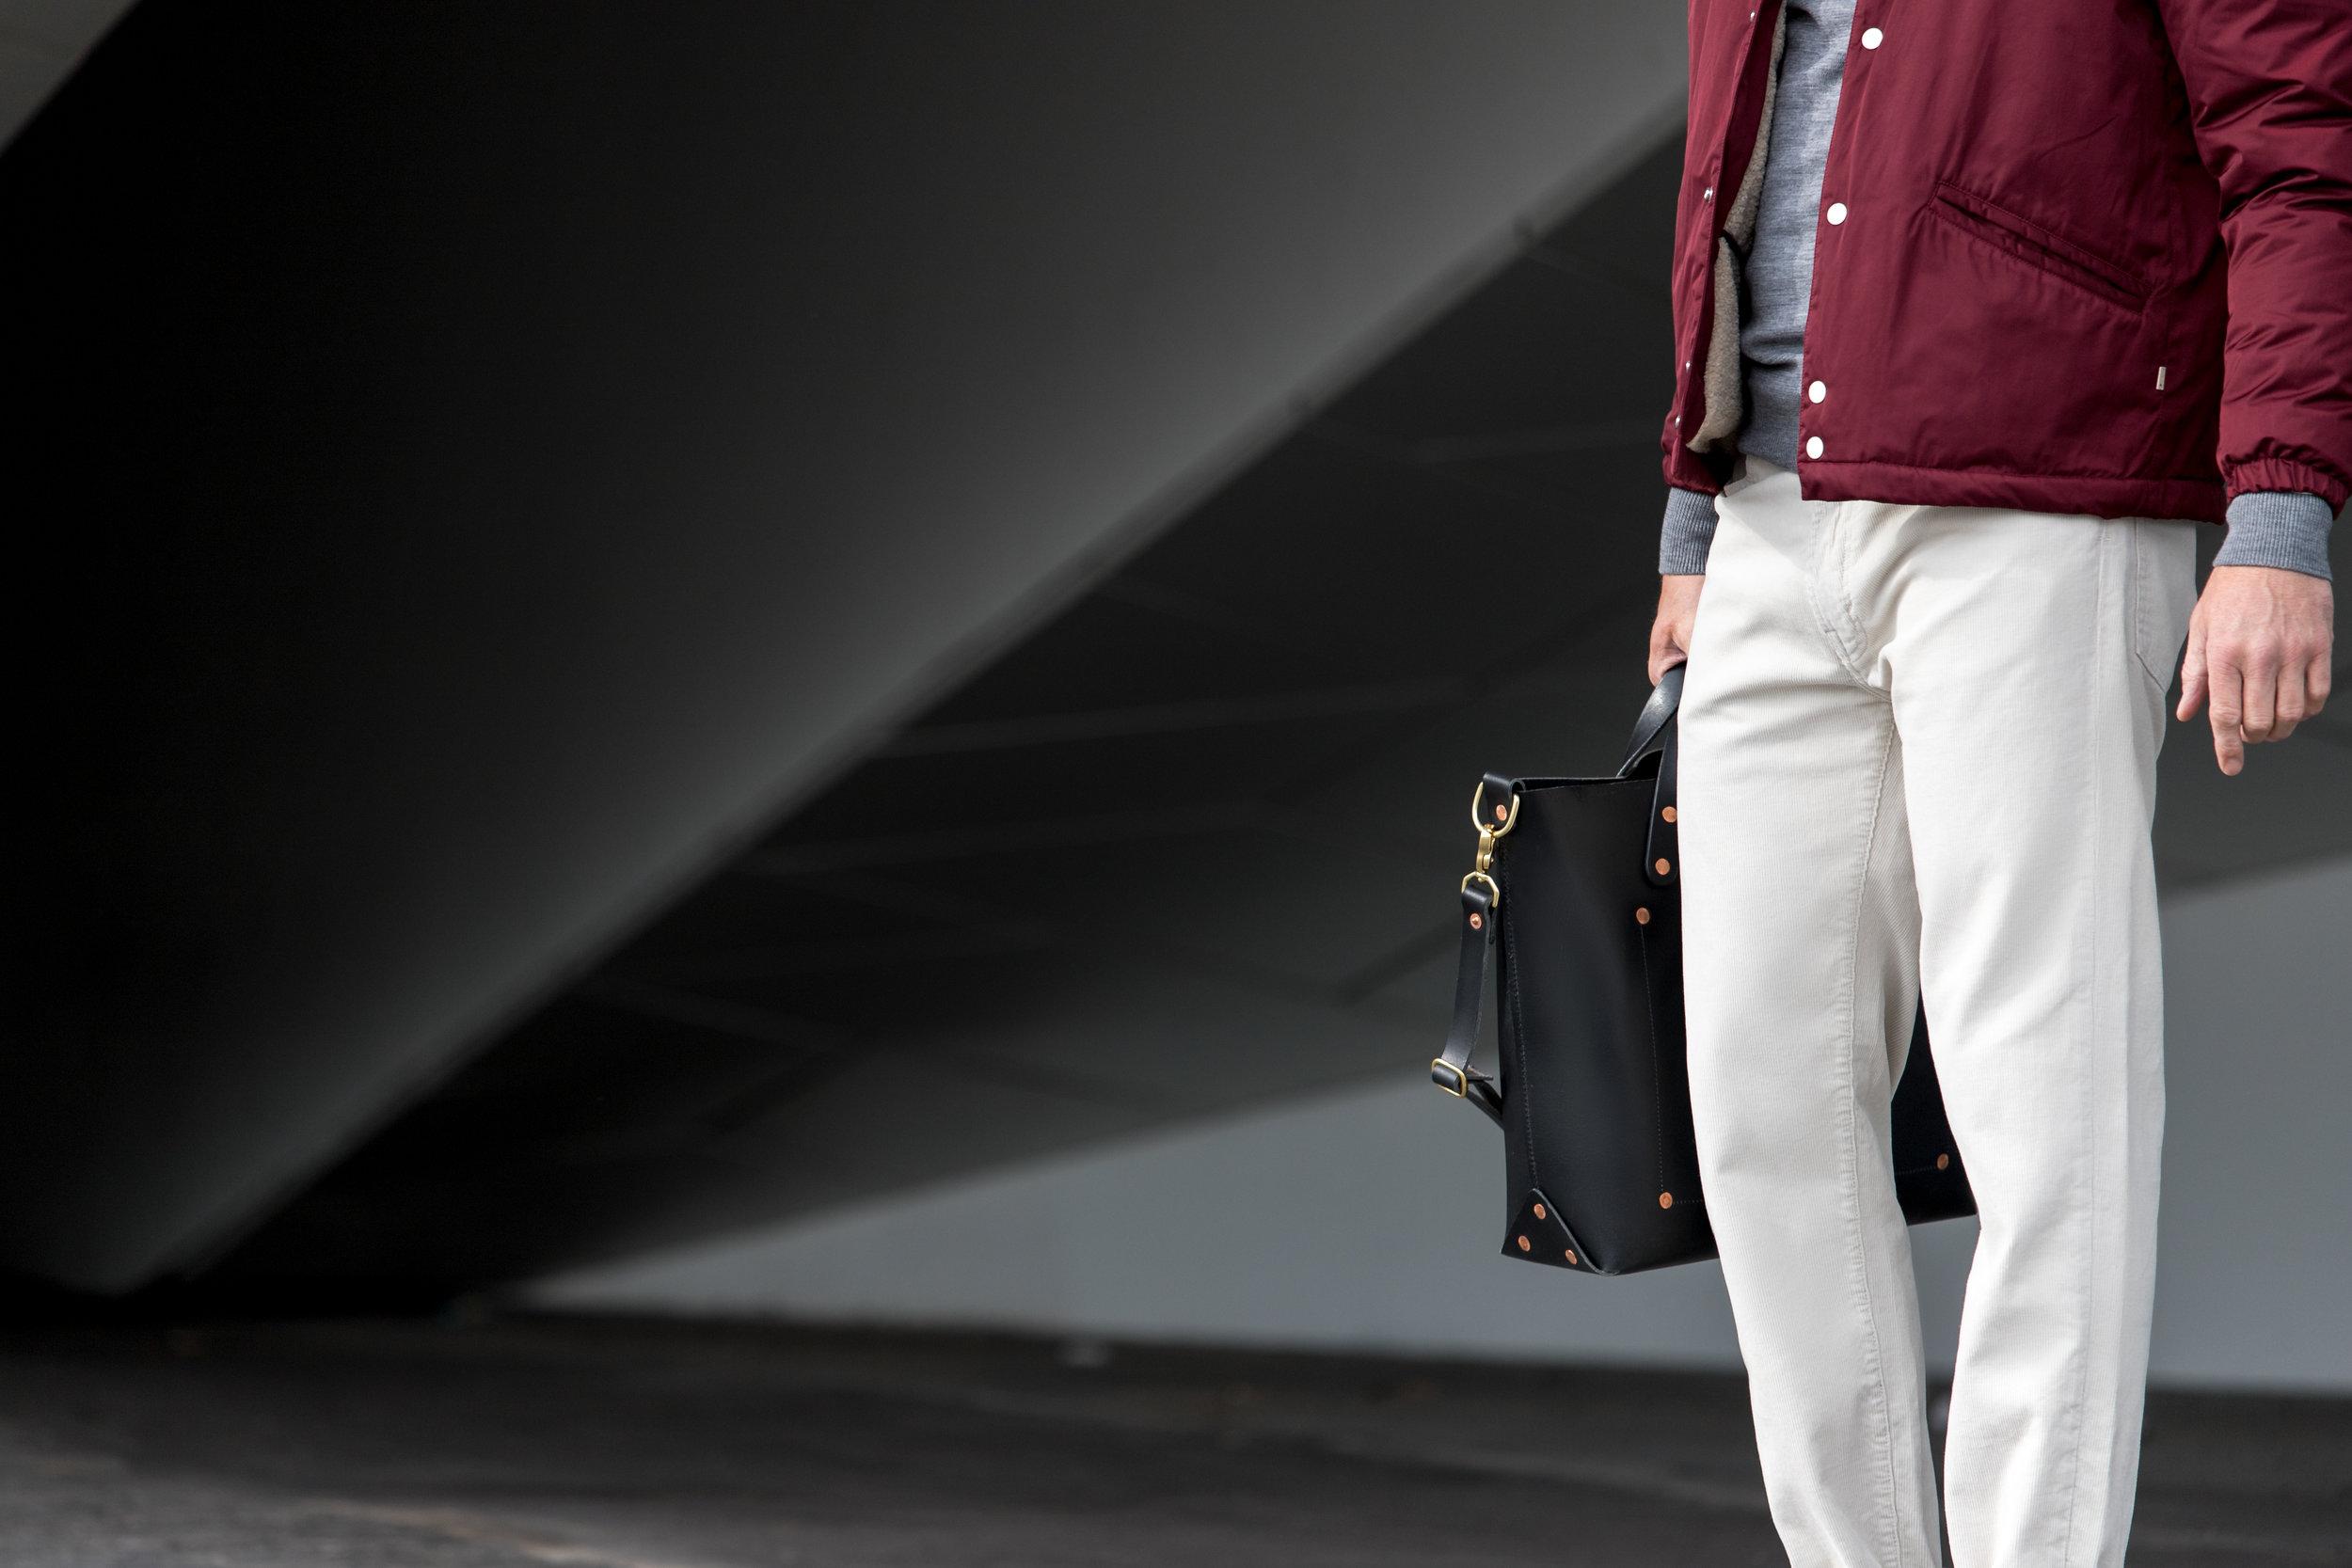 Bag: Dyemond Goods Leather bag //Jacket:  Bellerose LOWF jacket // Top:  Dilor knitted turtle neck //Pants:  Bellerose Peeg corduroy